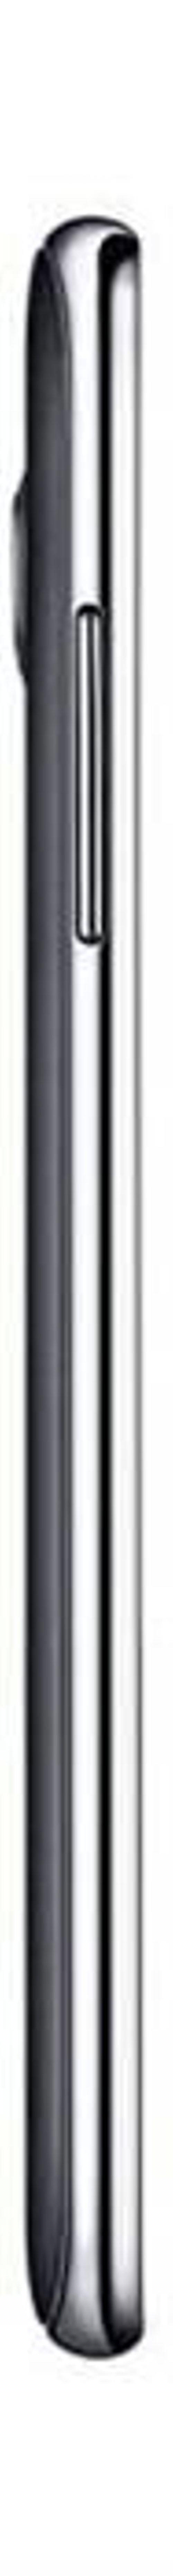 Samsung Galaxy J5 Smartphone 8GB 5inch Black